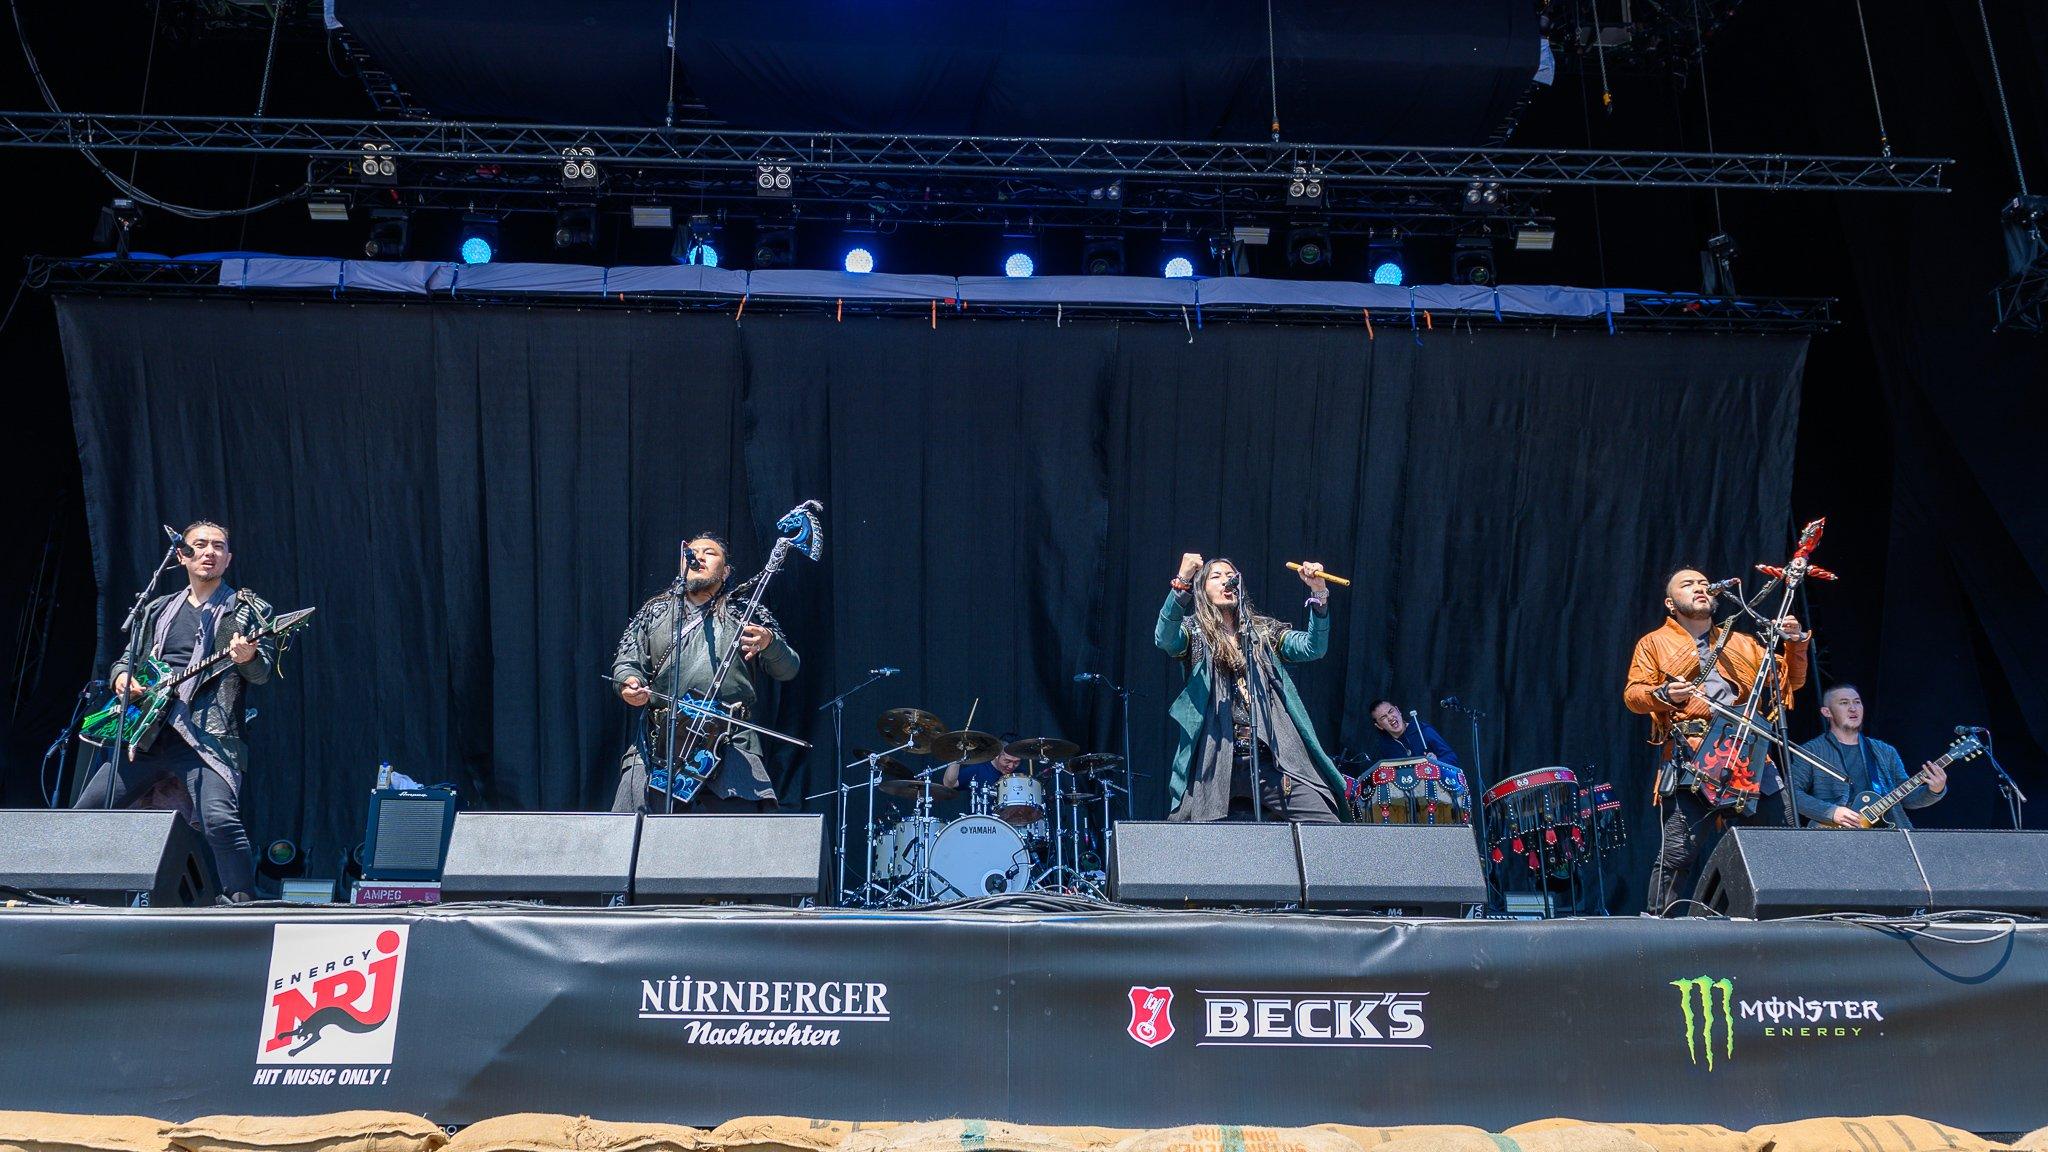 The Hu於2019年在Rock im Park進行了表演。(維基百科)